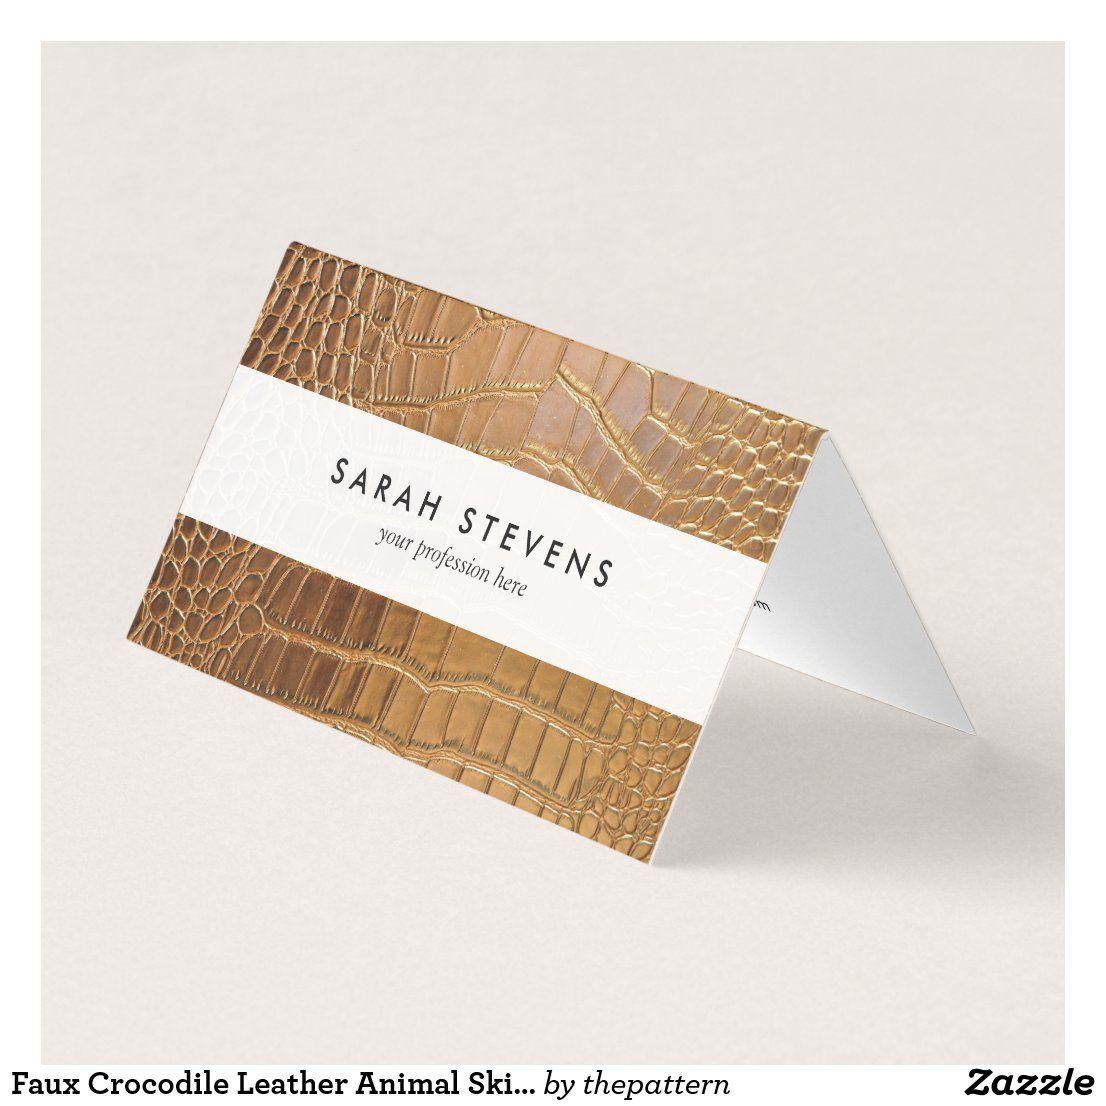 Faux Crocodile Leather Animal Skin Pattern Business Card Zazzle Com In 2021 Business Card Pattern Crocodile Leather Animal Skin